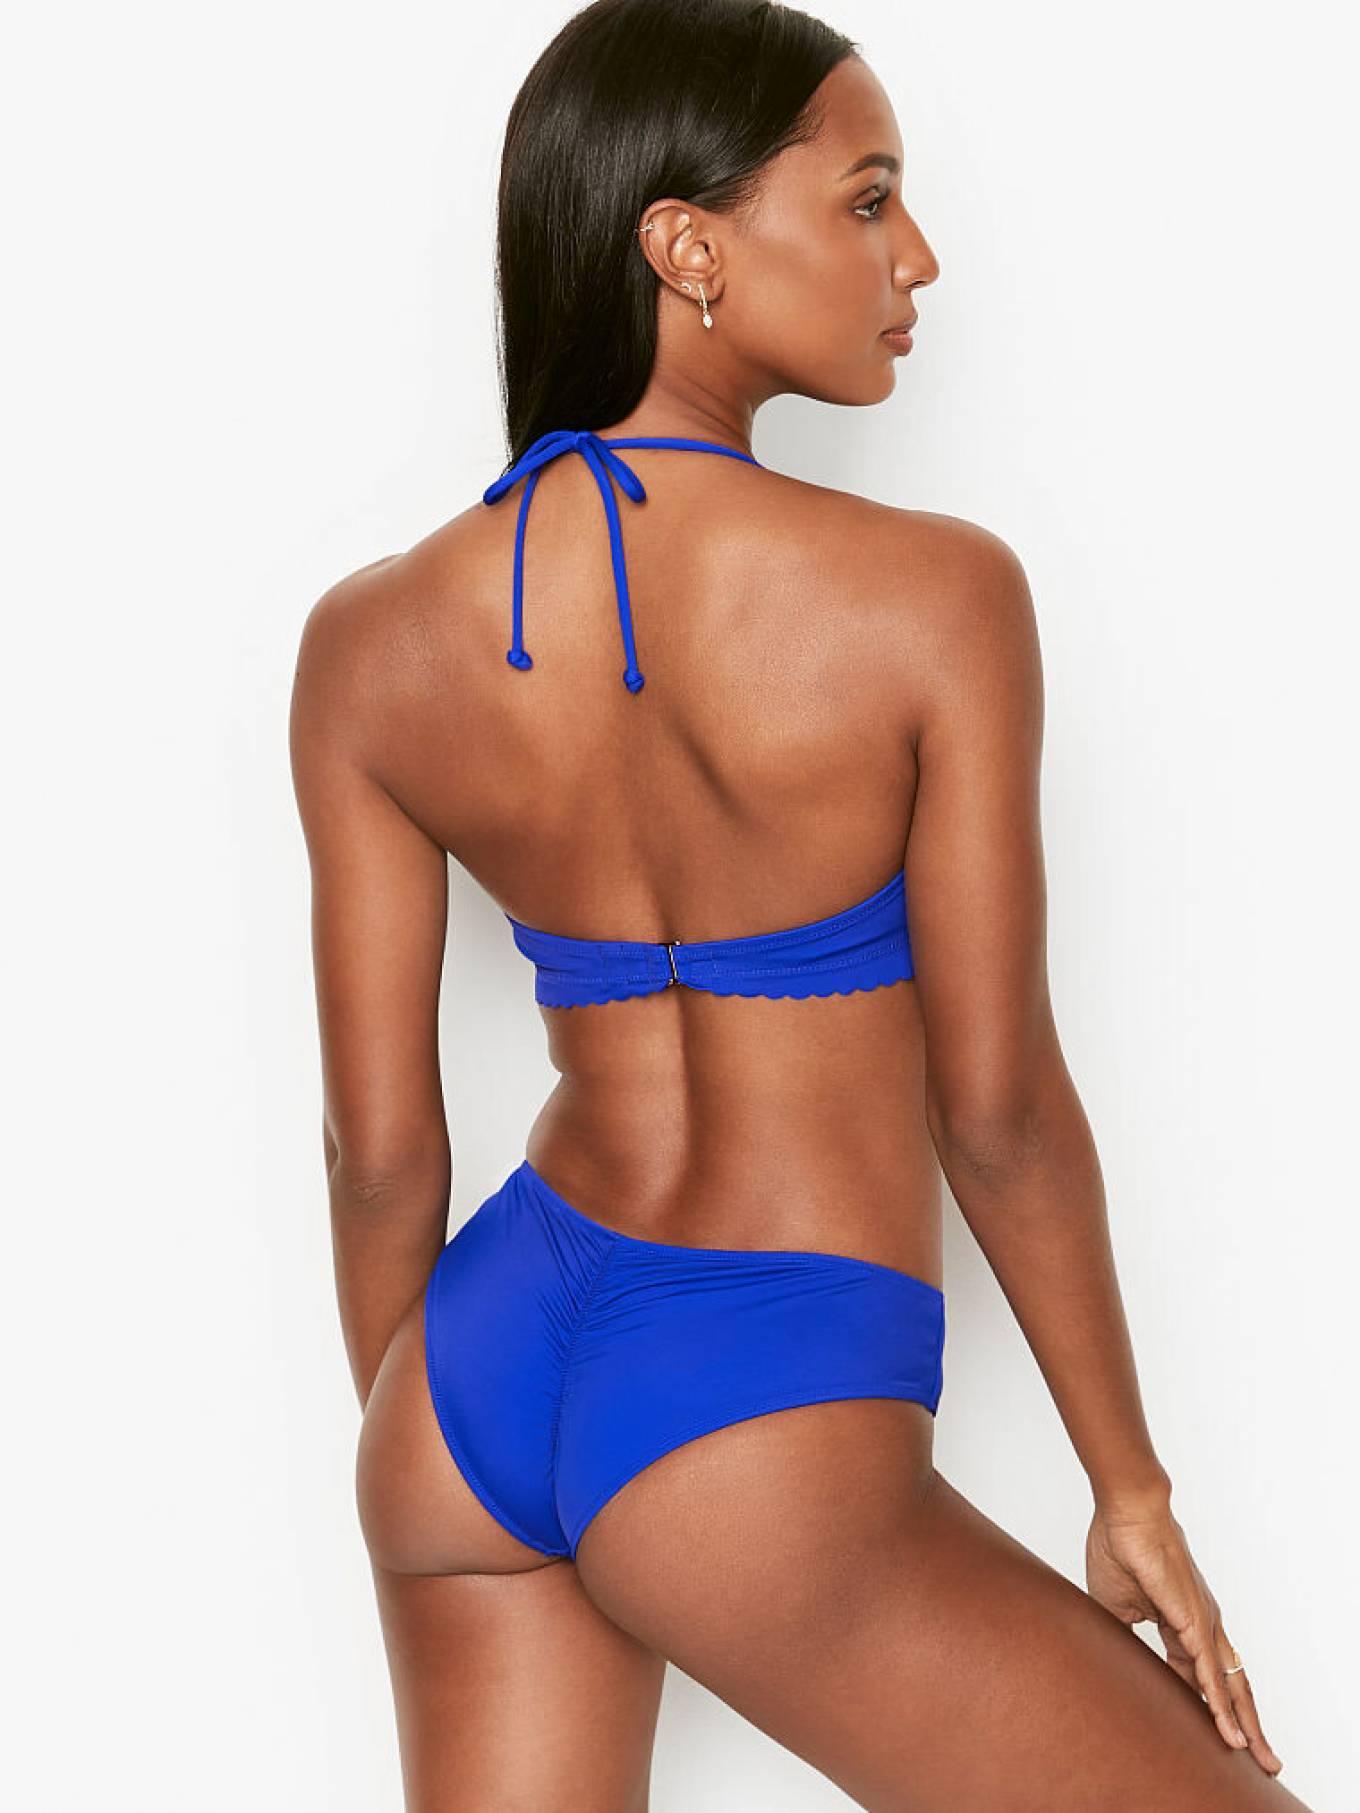 Jasmine Tookes 2020 : Jasmine Tookes – Victorias Secret collection – November 2020-11